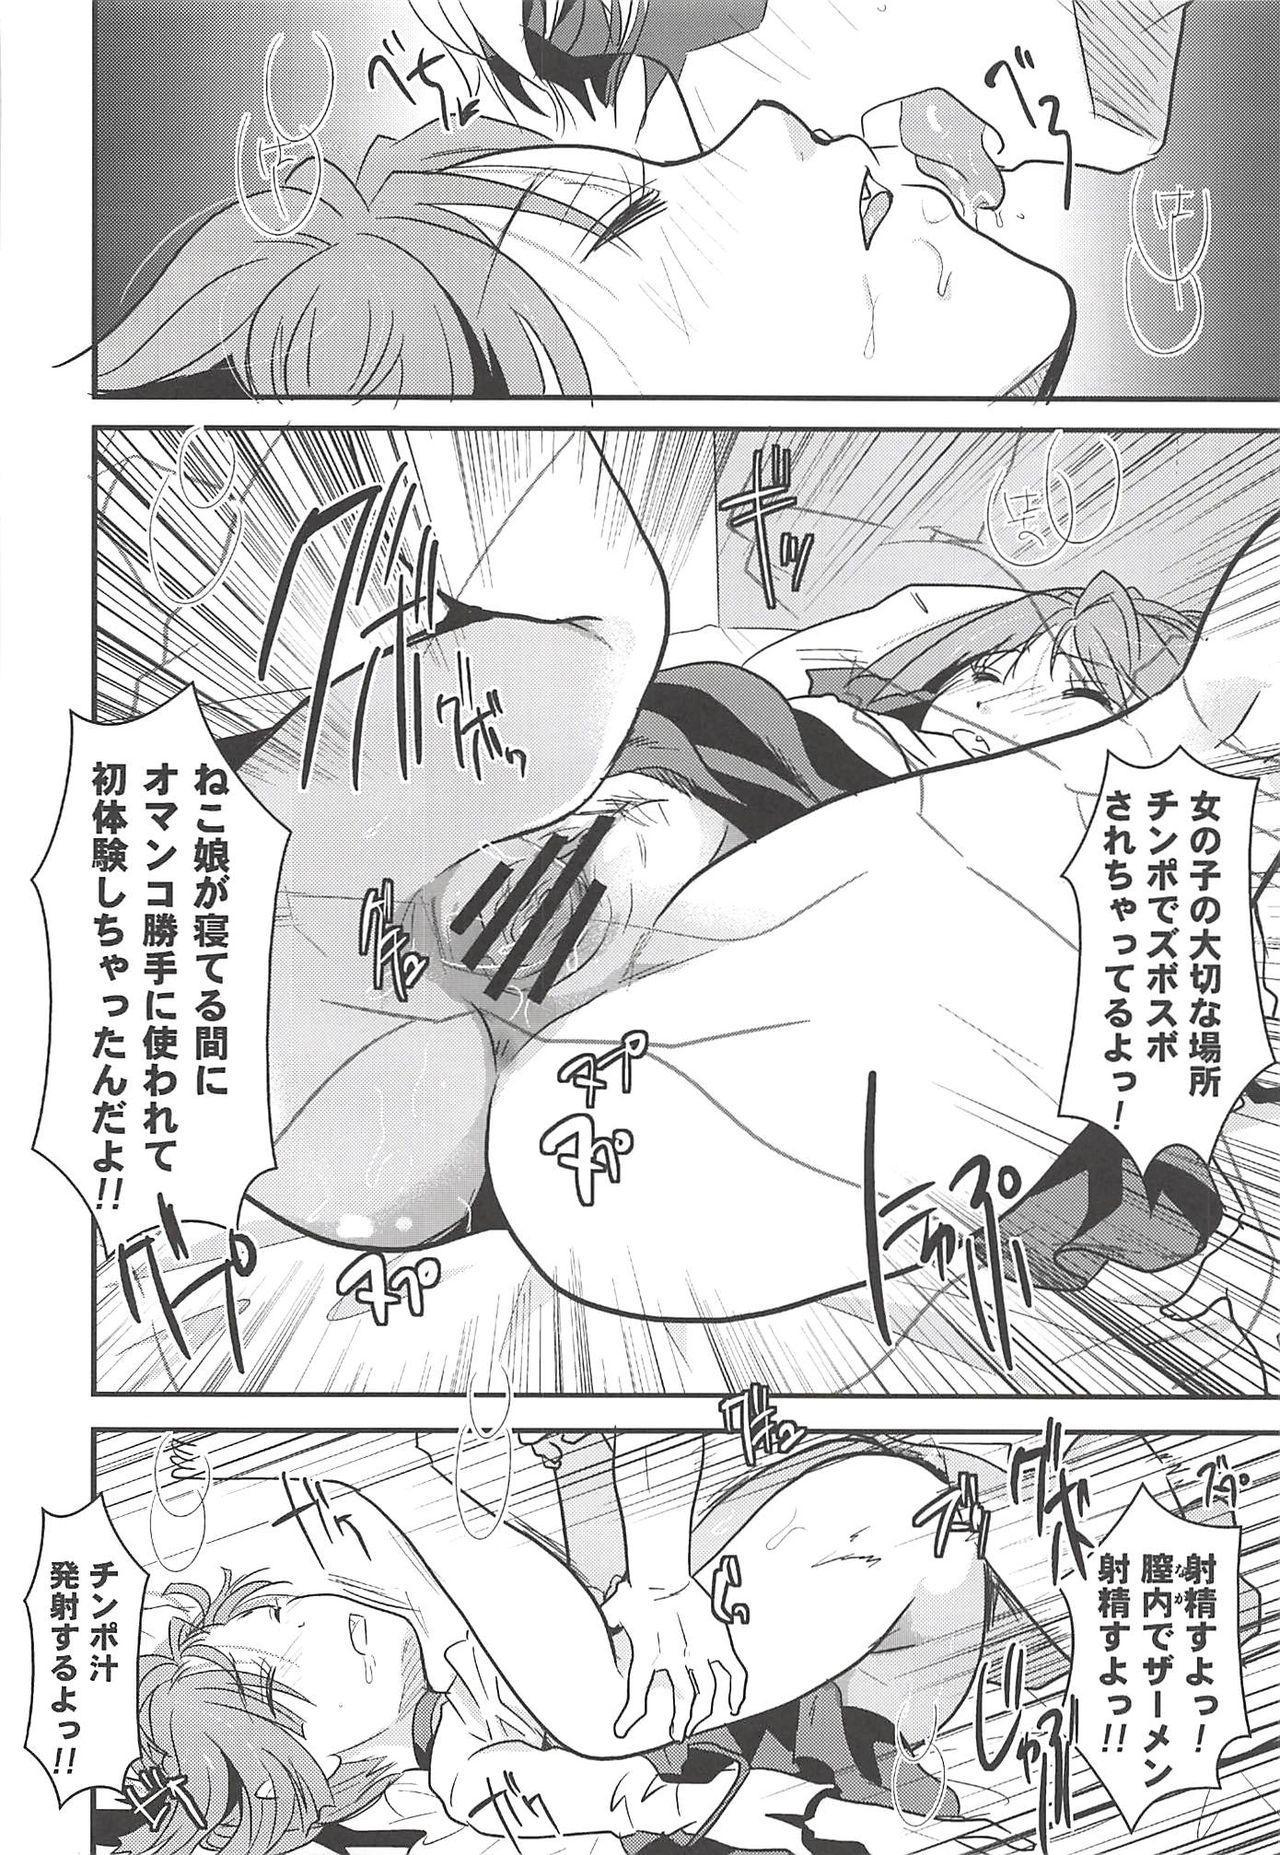 Neko Musume Suikan 40